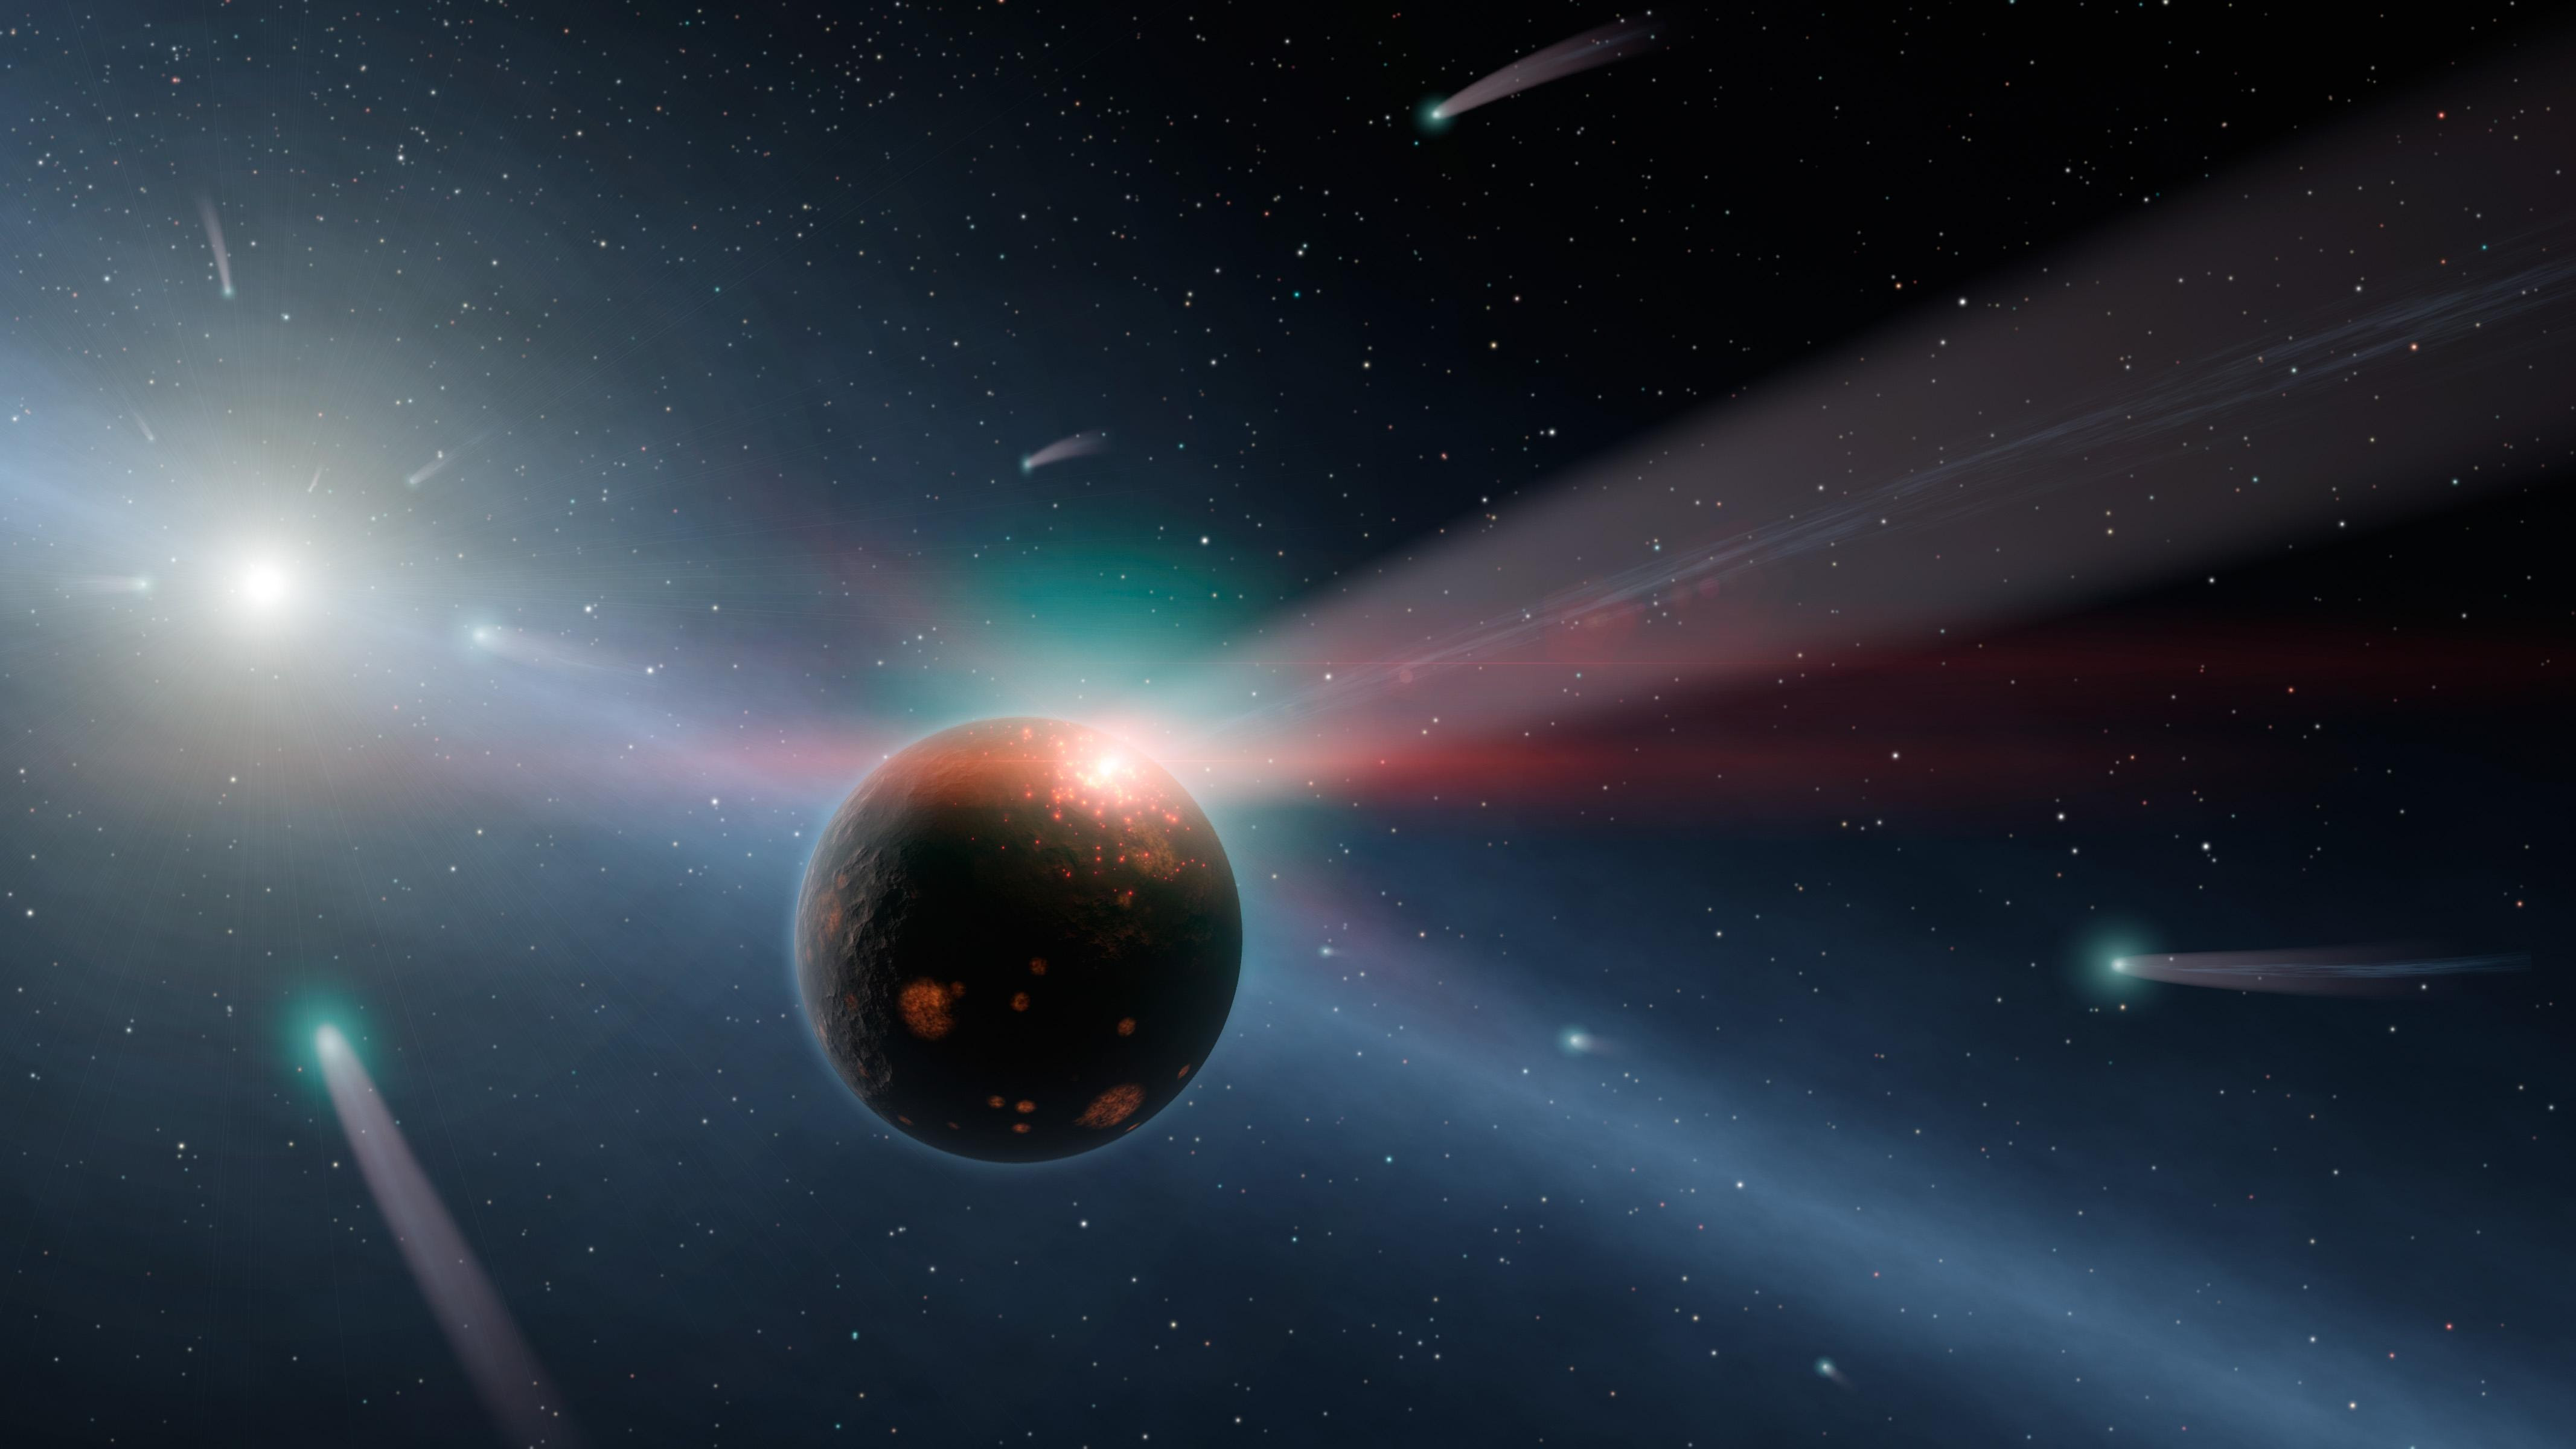 http://upload.wikimedia.org/wikipedia/commons/7/70/It%27s_Raining_Comets_(Eta_Corvi).jpg